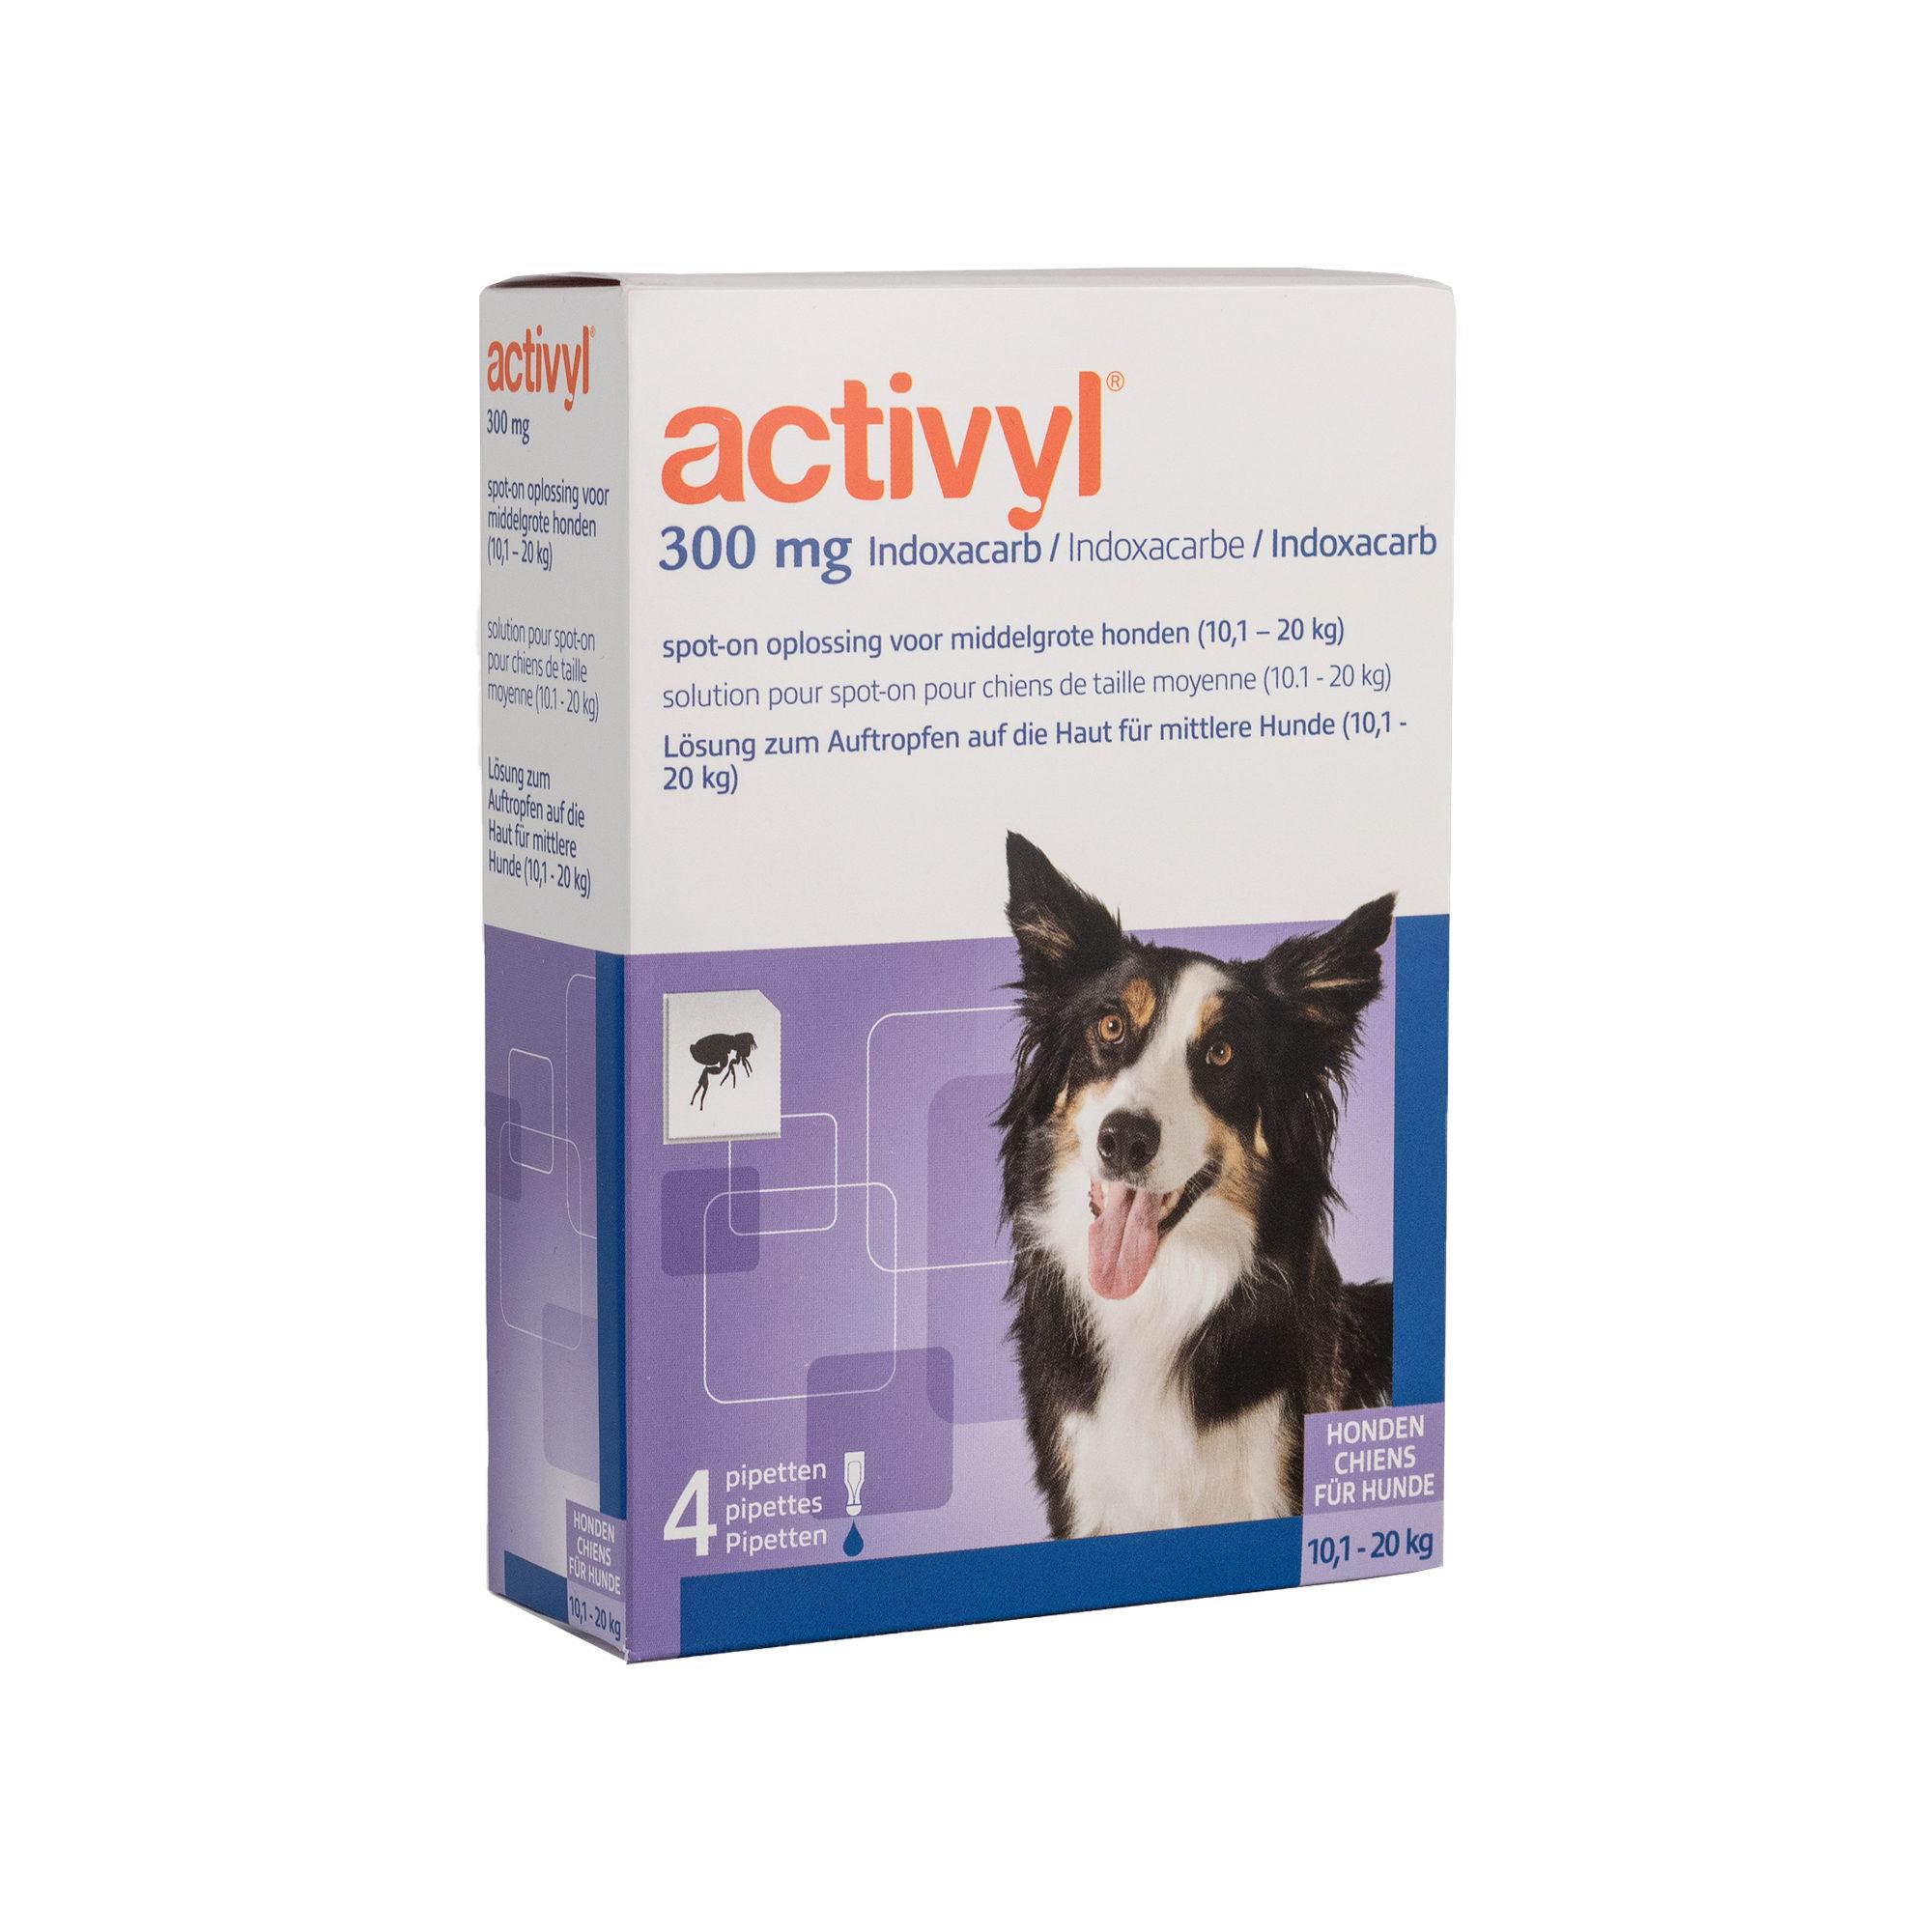 Activyl Spot-on Hund M - 10 - 20 kg